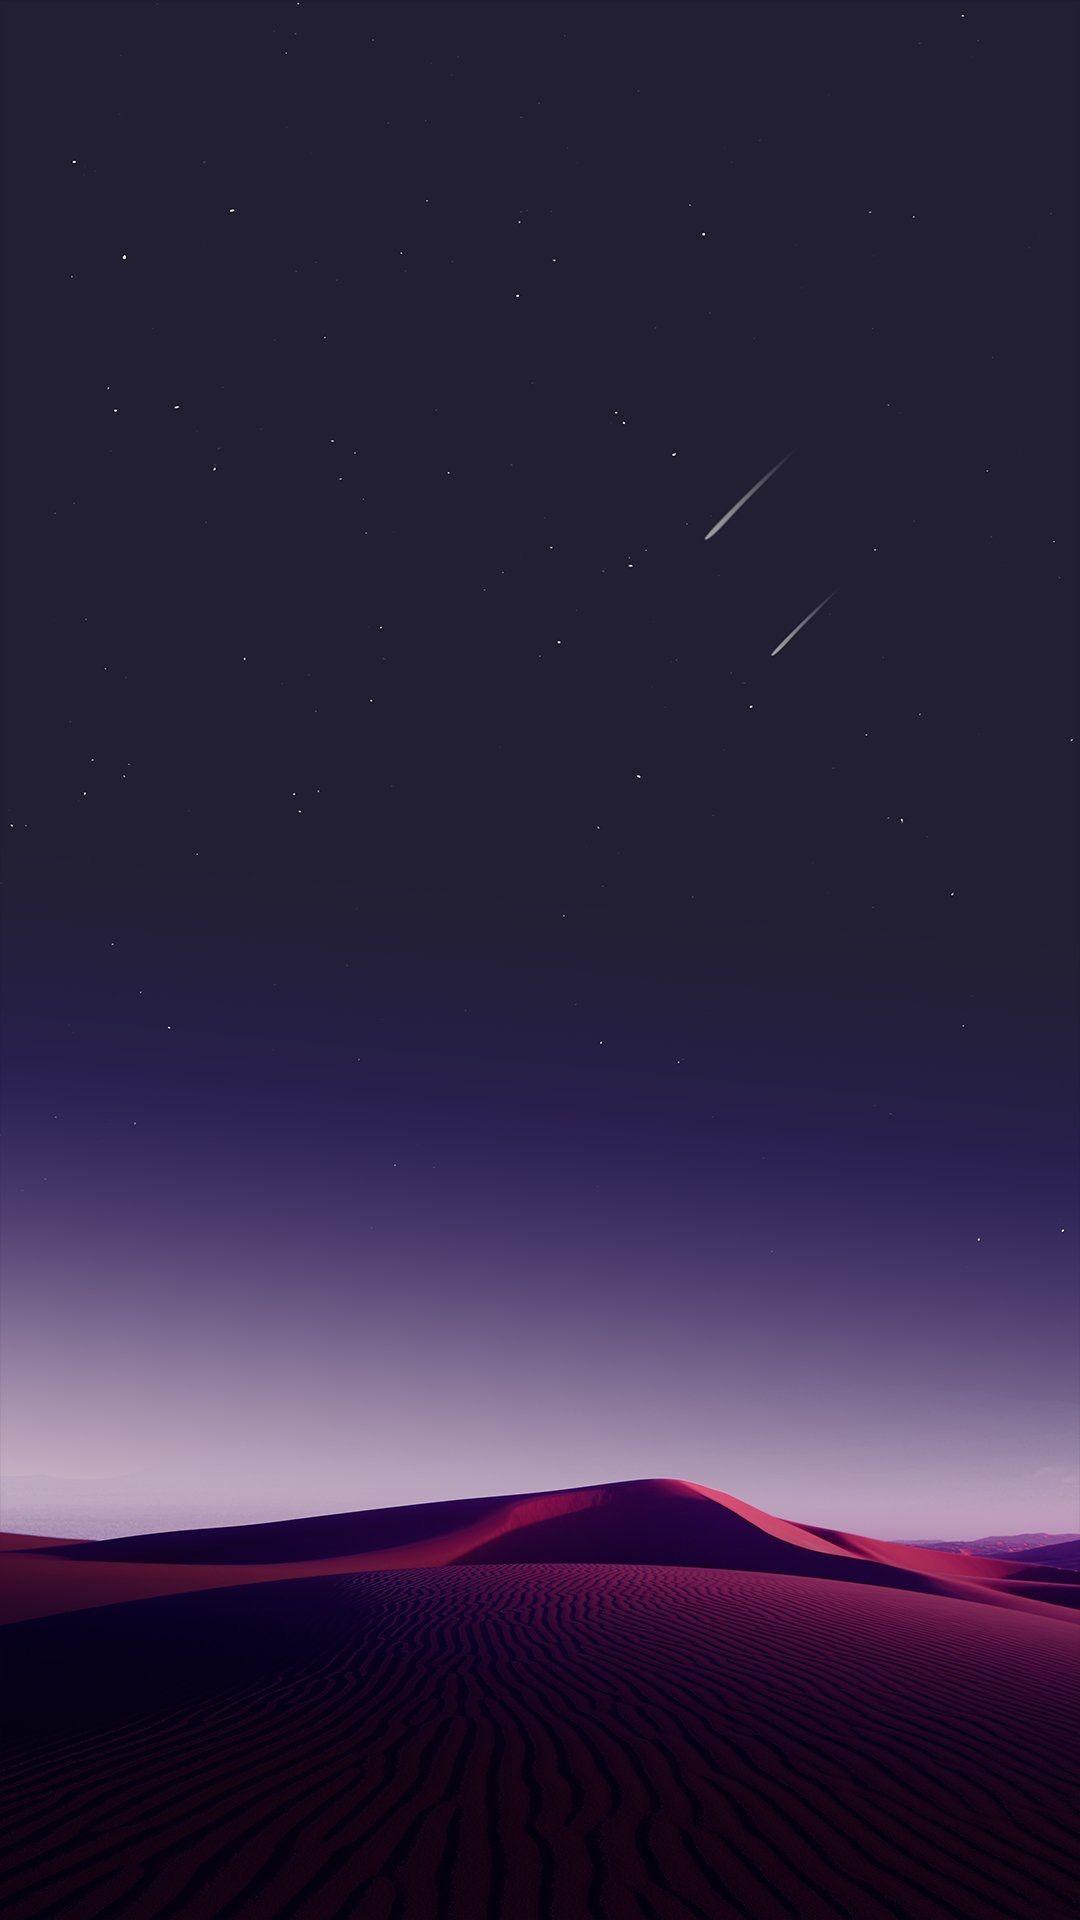 Desert Sky Shooting Stars Iphone Wallpaper In 2020 S8 Wallpaper Smartphone Wallpaper Phone Wallpaper